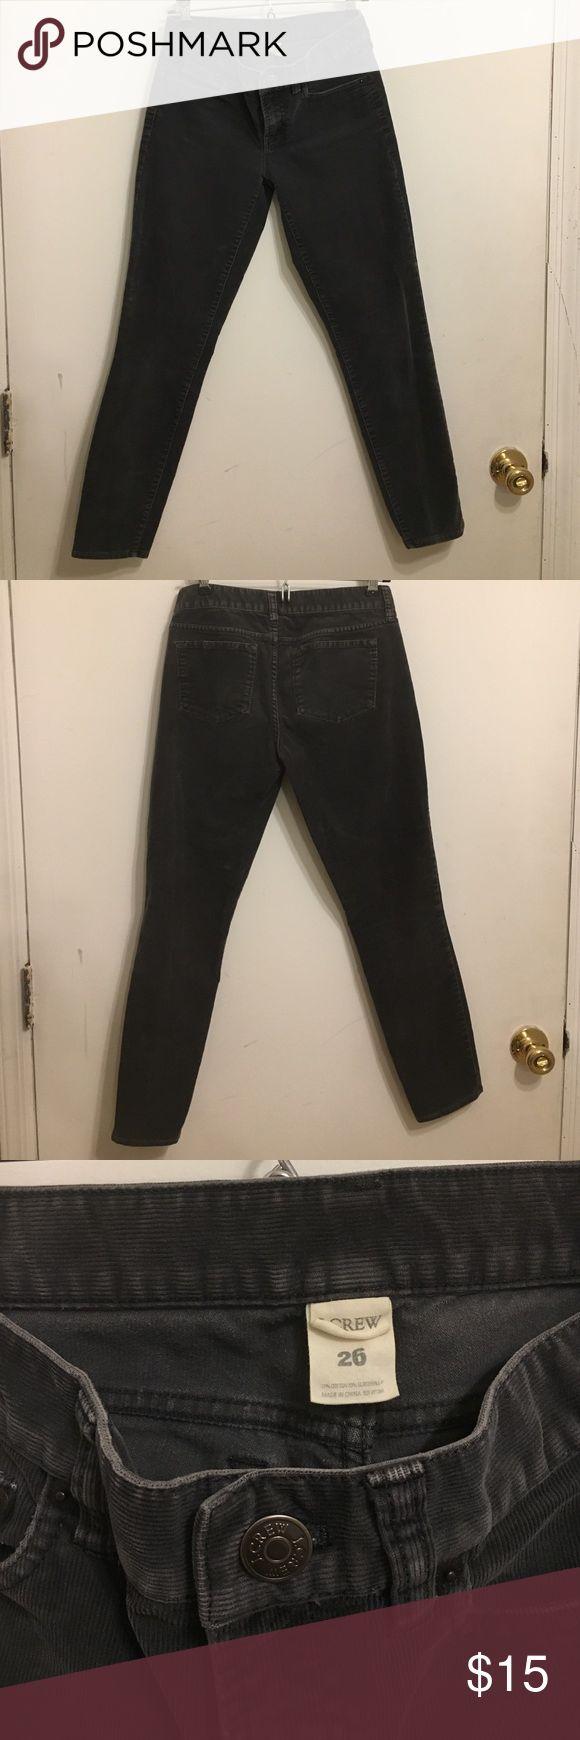 Jcrew Cropped Cord Pants Dark grey cord pants J. Crew Pants Ankle & Cropped